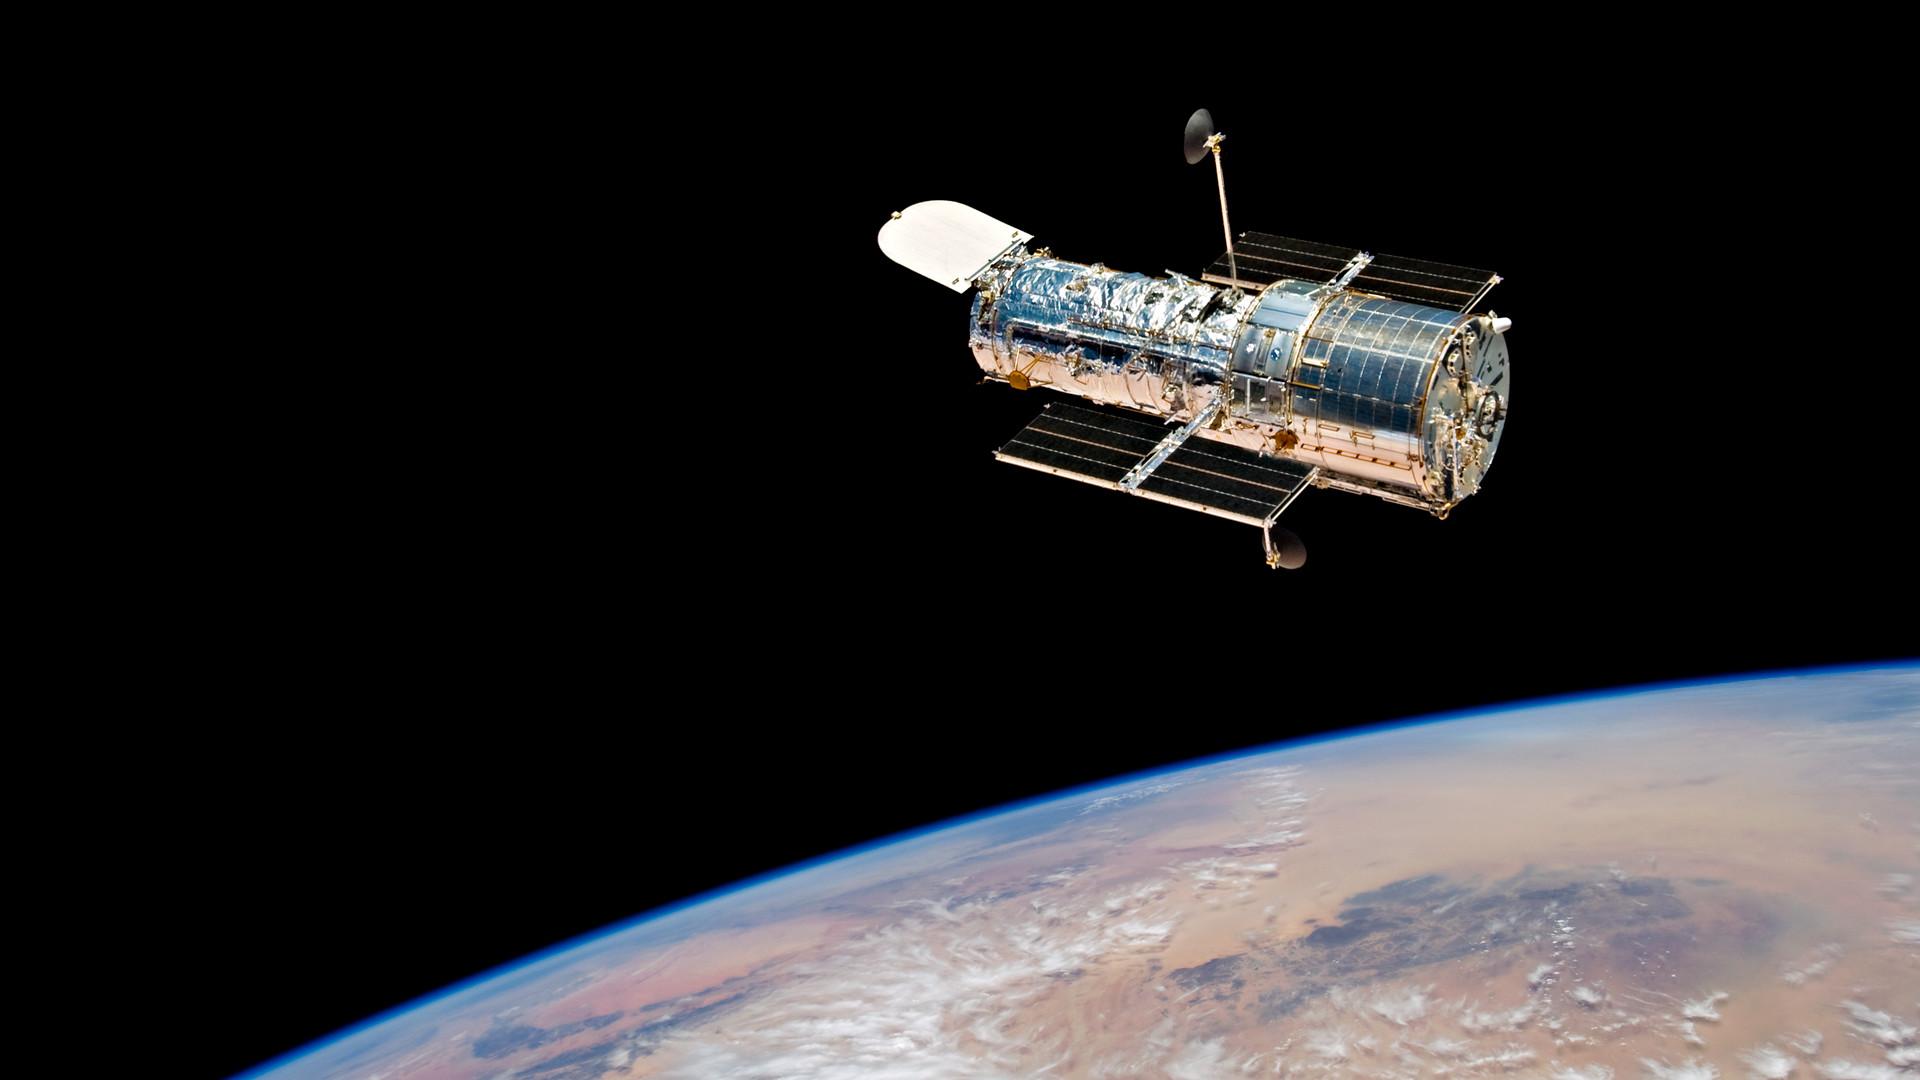 Photograph of Hubble Space Telescope in orbit